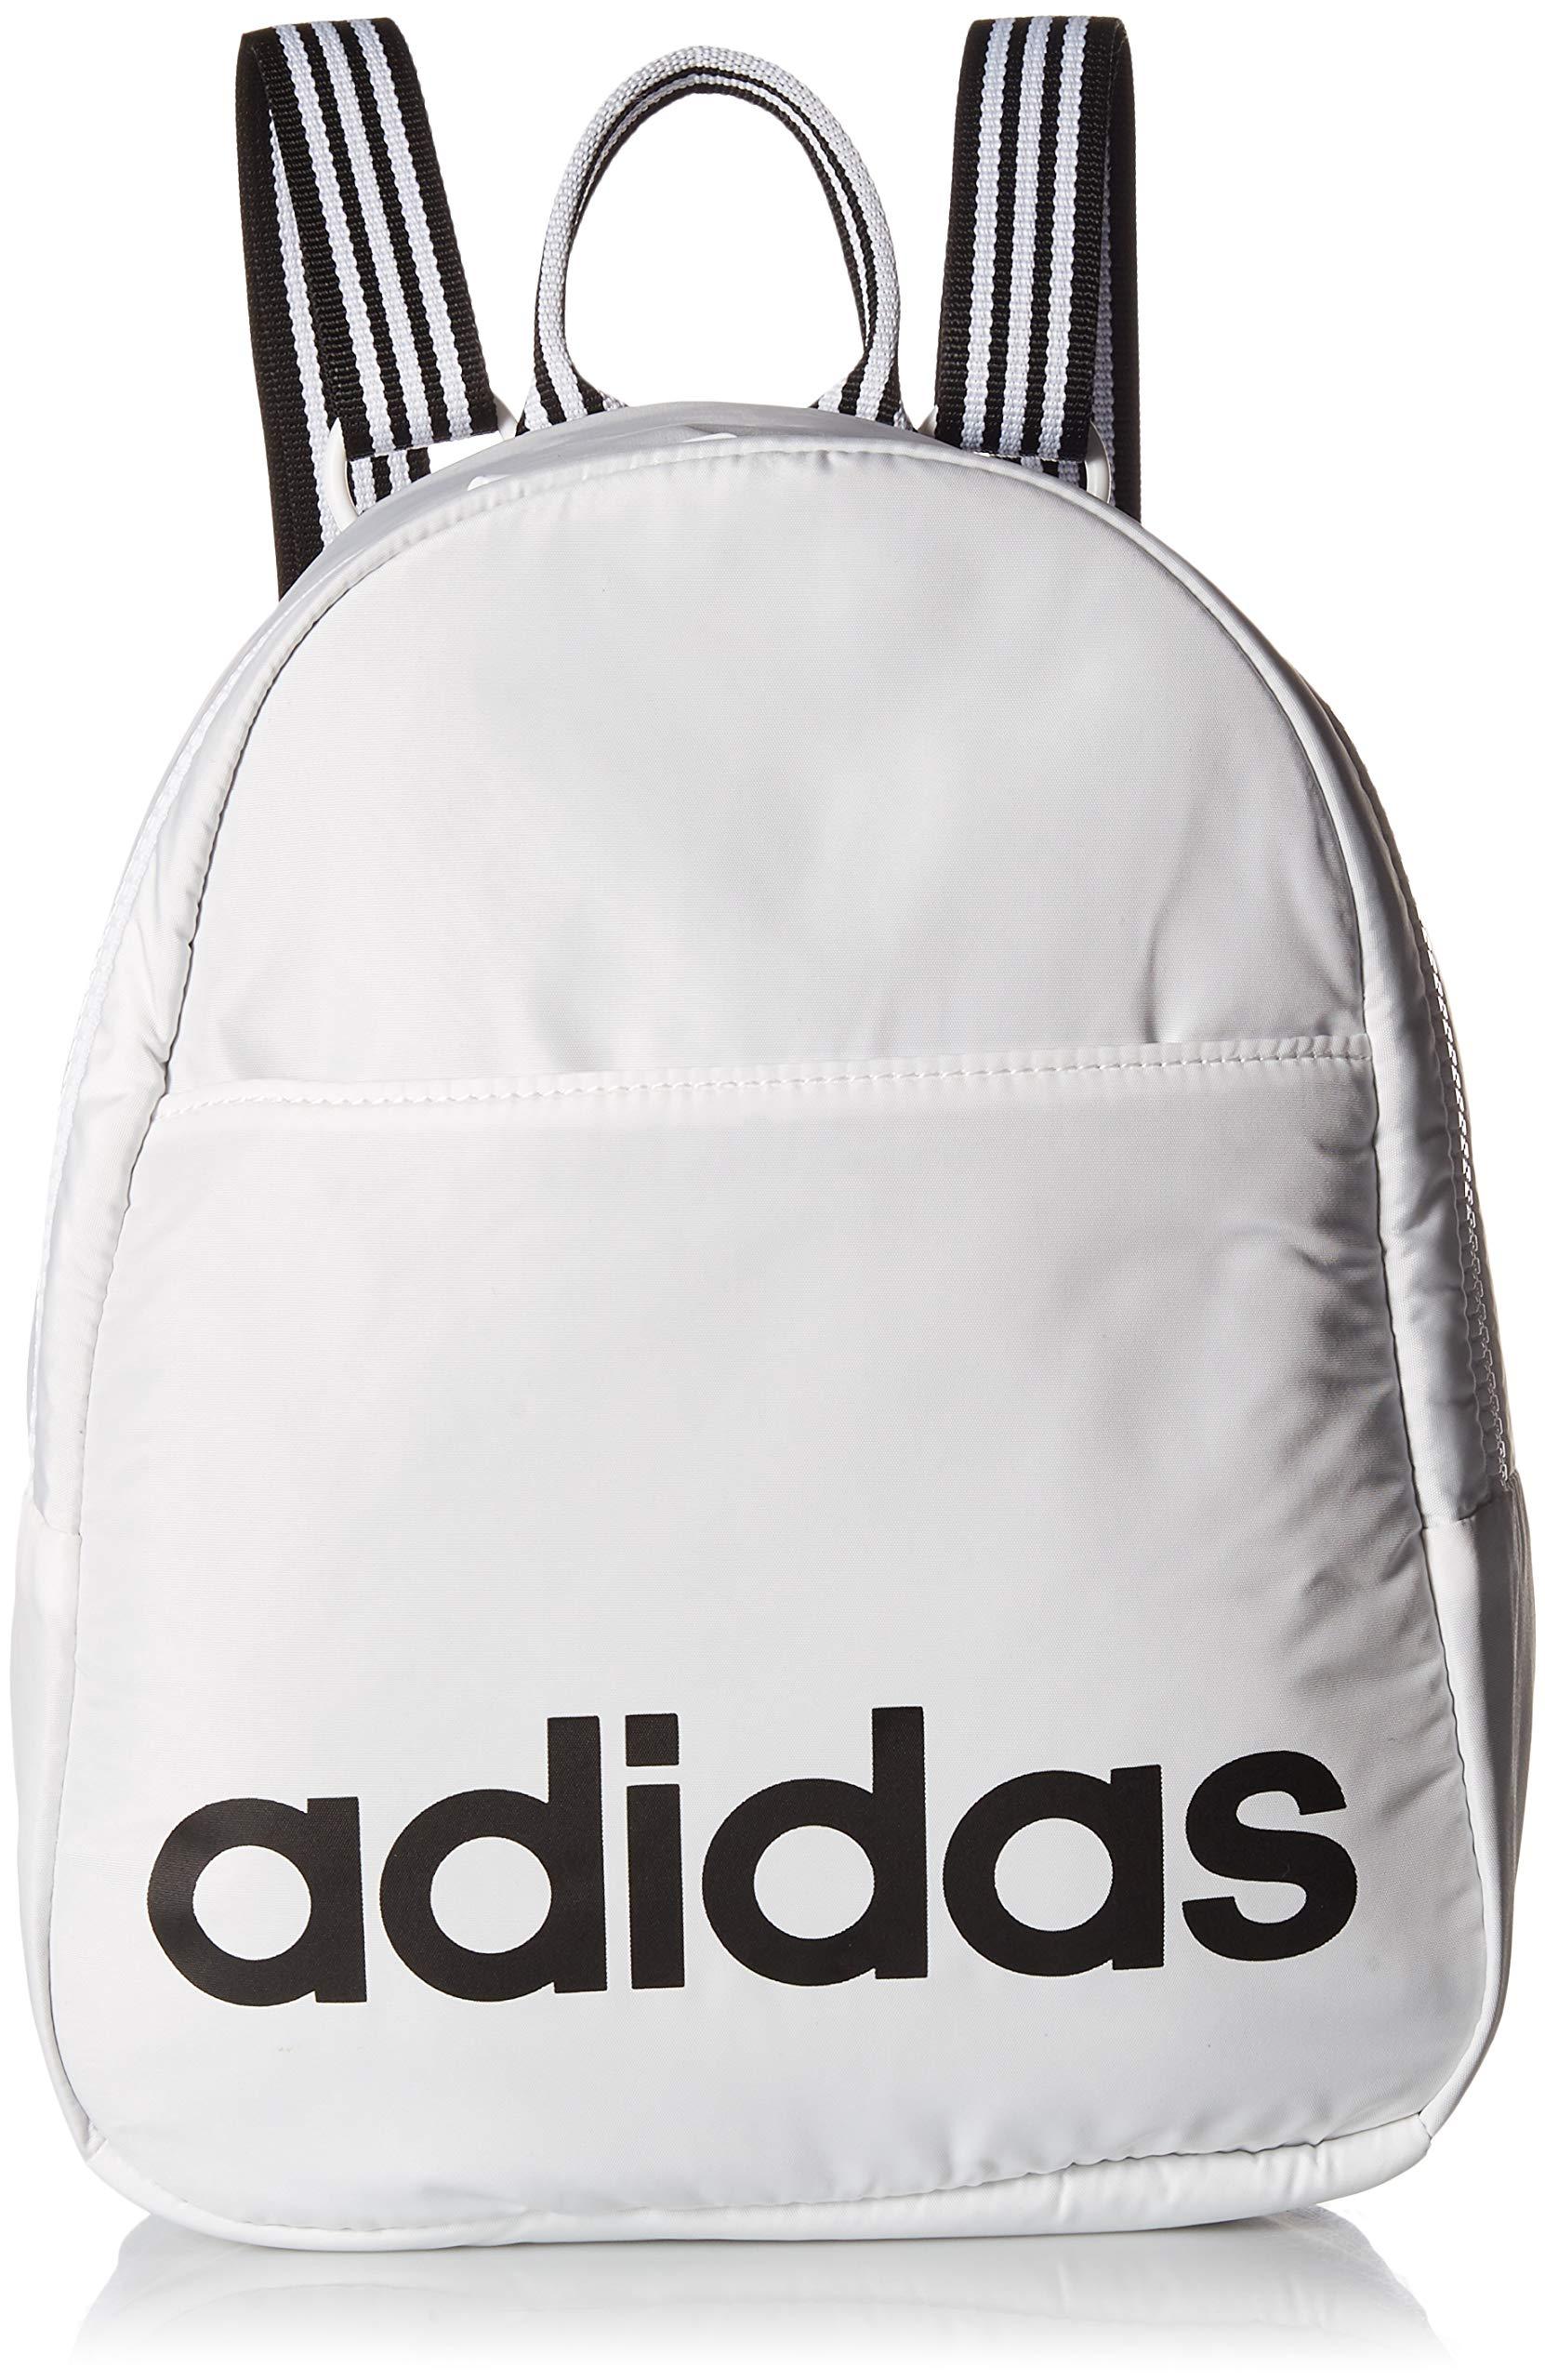 adidas Core Mini Backpack, White/Black, One Size